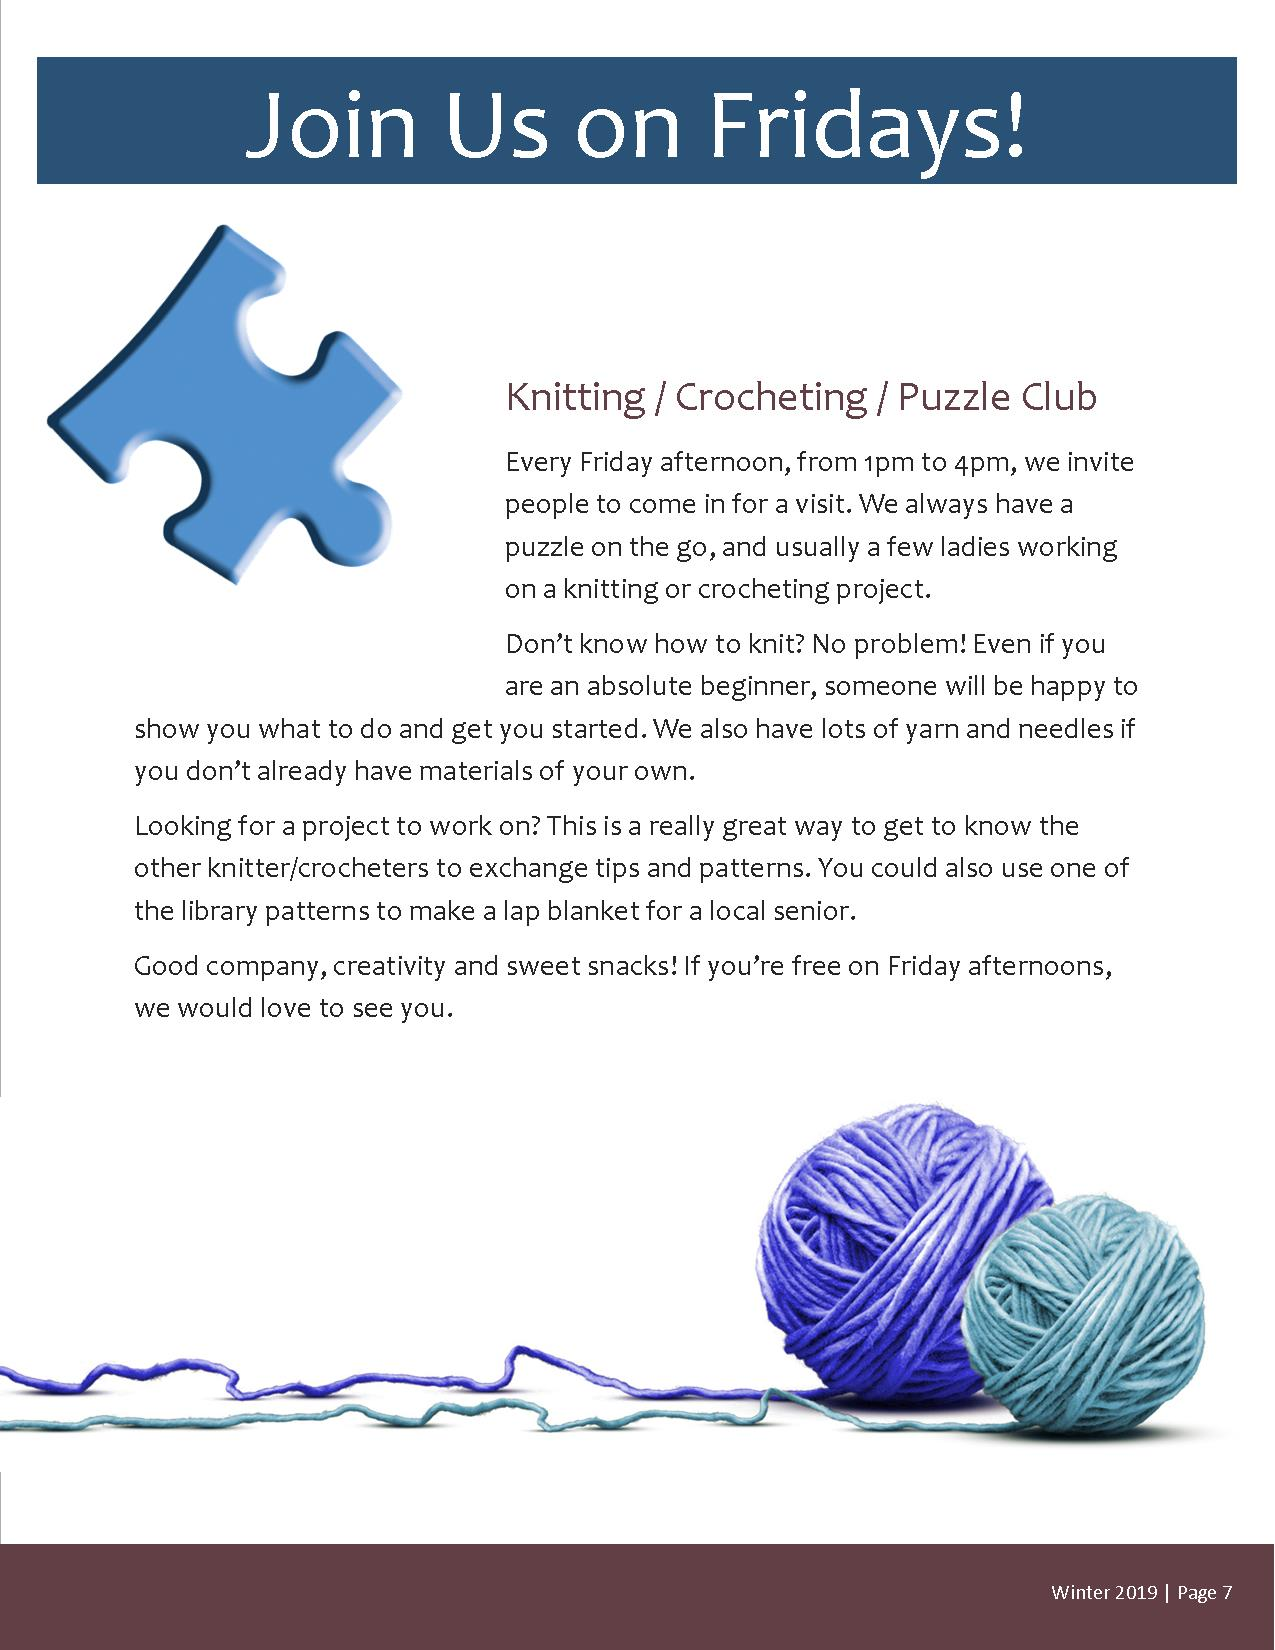 Knitting/Crocheting/Puzzle Club @ Magnetawan Community Centre